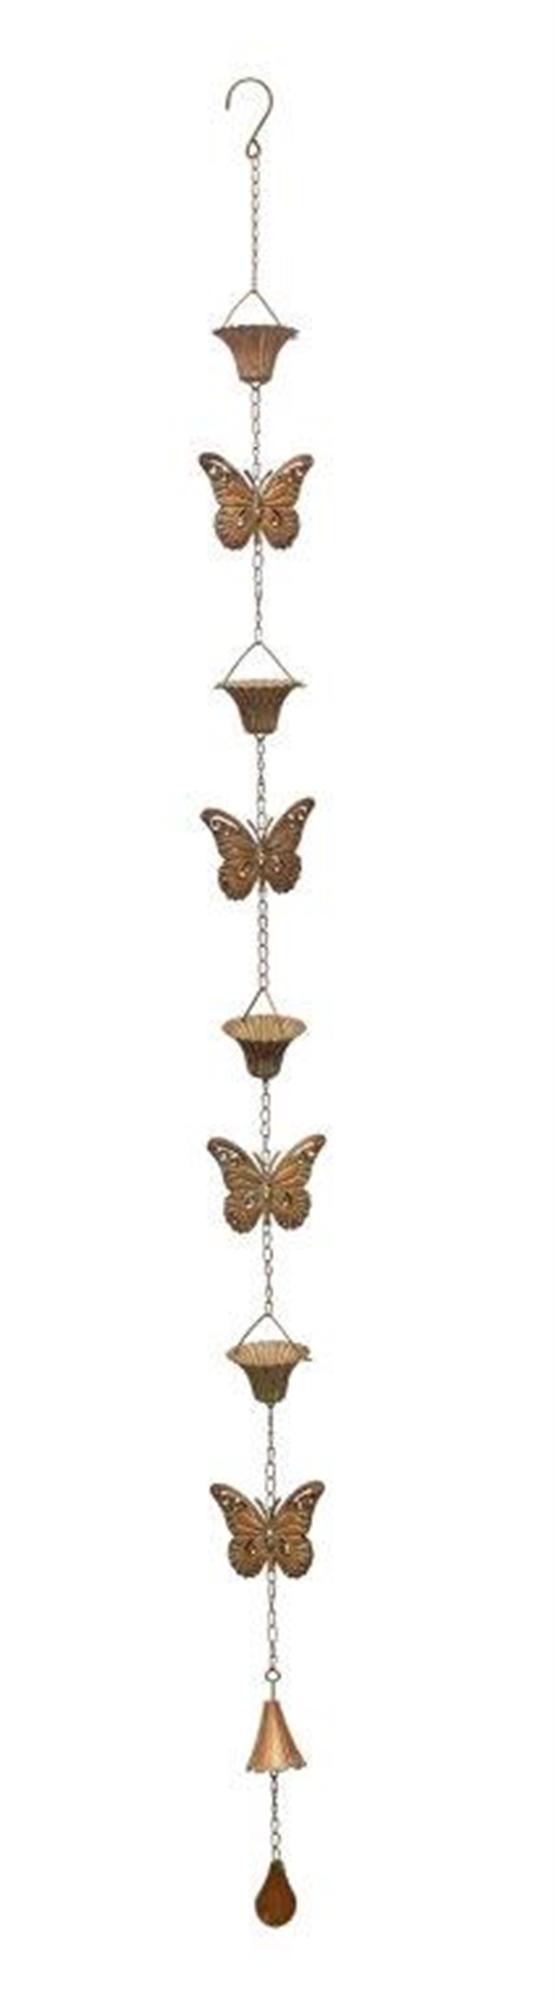 "Butterfly Rain Chain 61.5""L Iron"